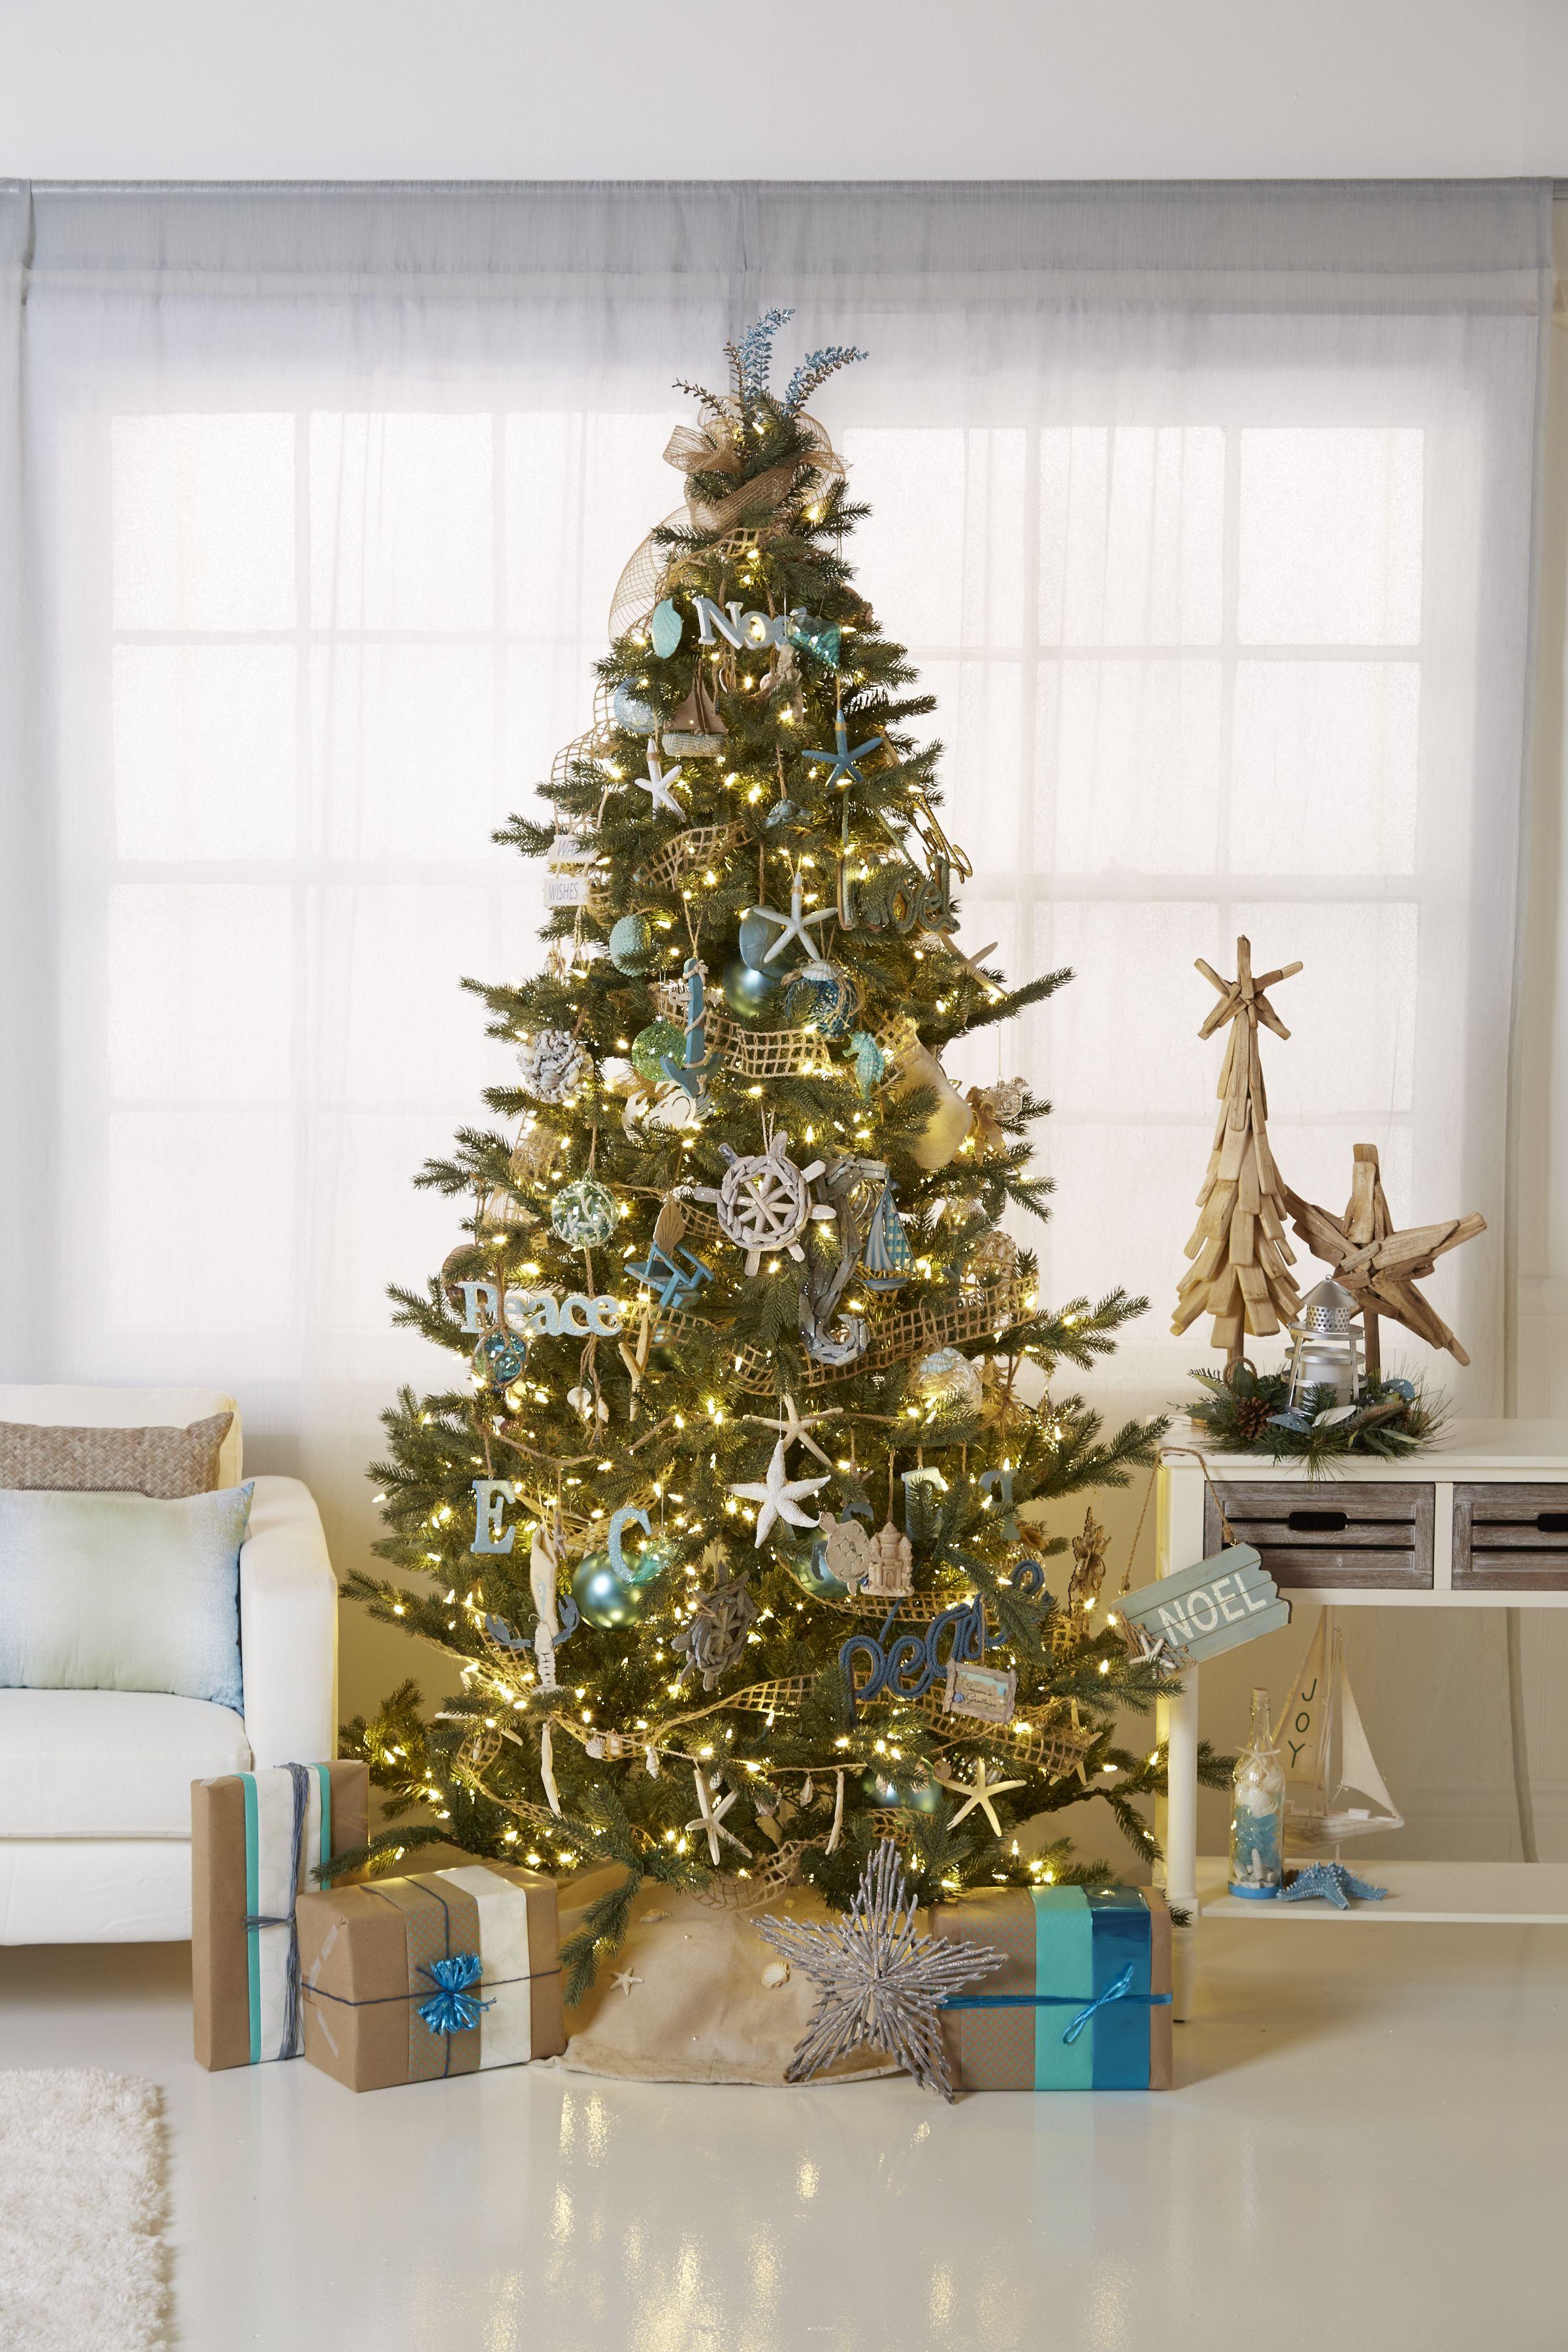 coastal wishes trim your christmas tree with a piece of florida starfish driftwood - Christmas Tree Shop Florida